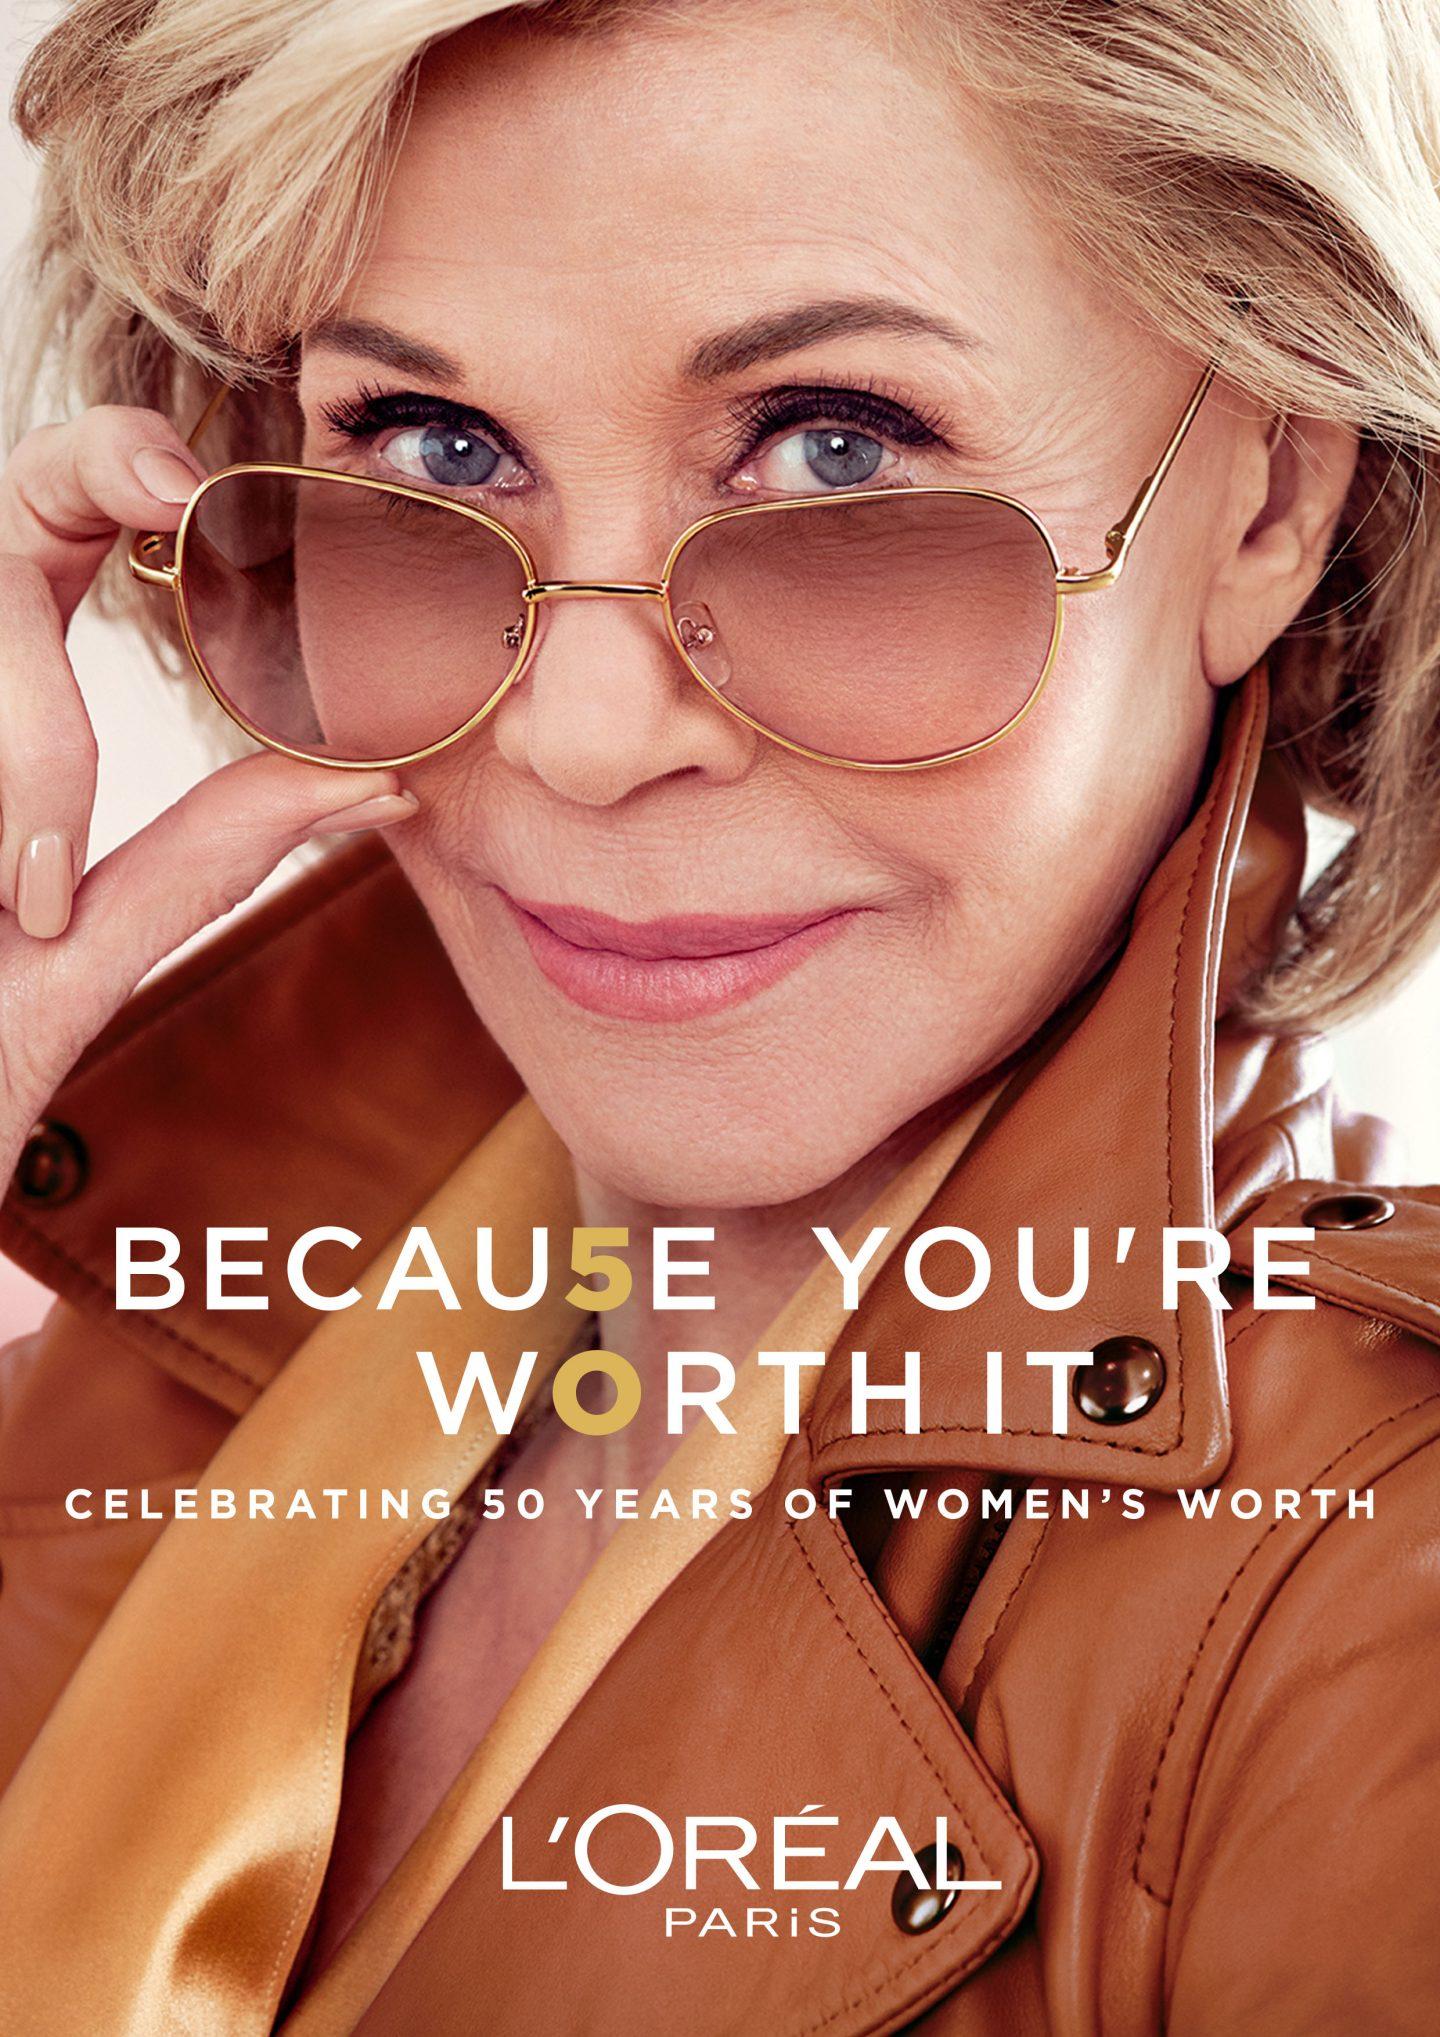 Jane Fonda wearing sunglasses and a light brown coat in a L'Oreal Paris advert